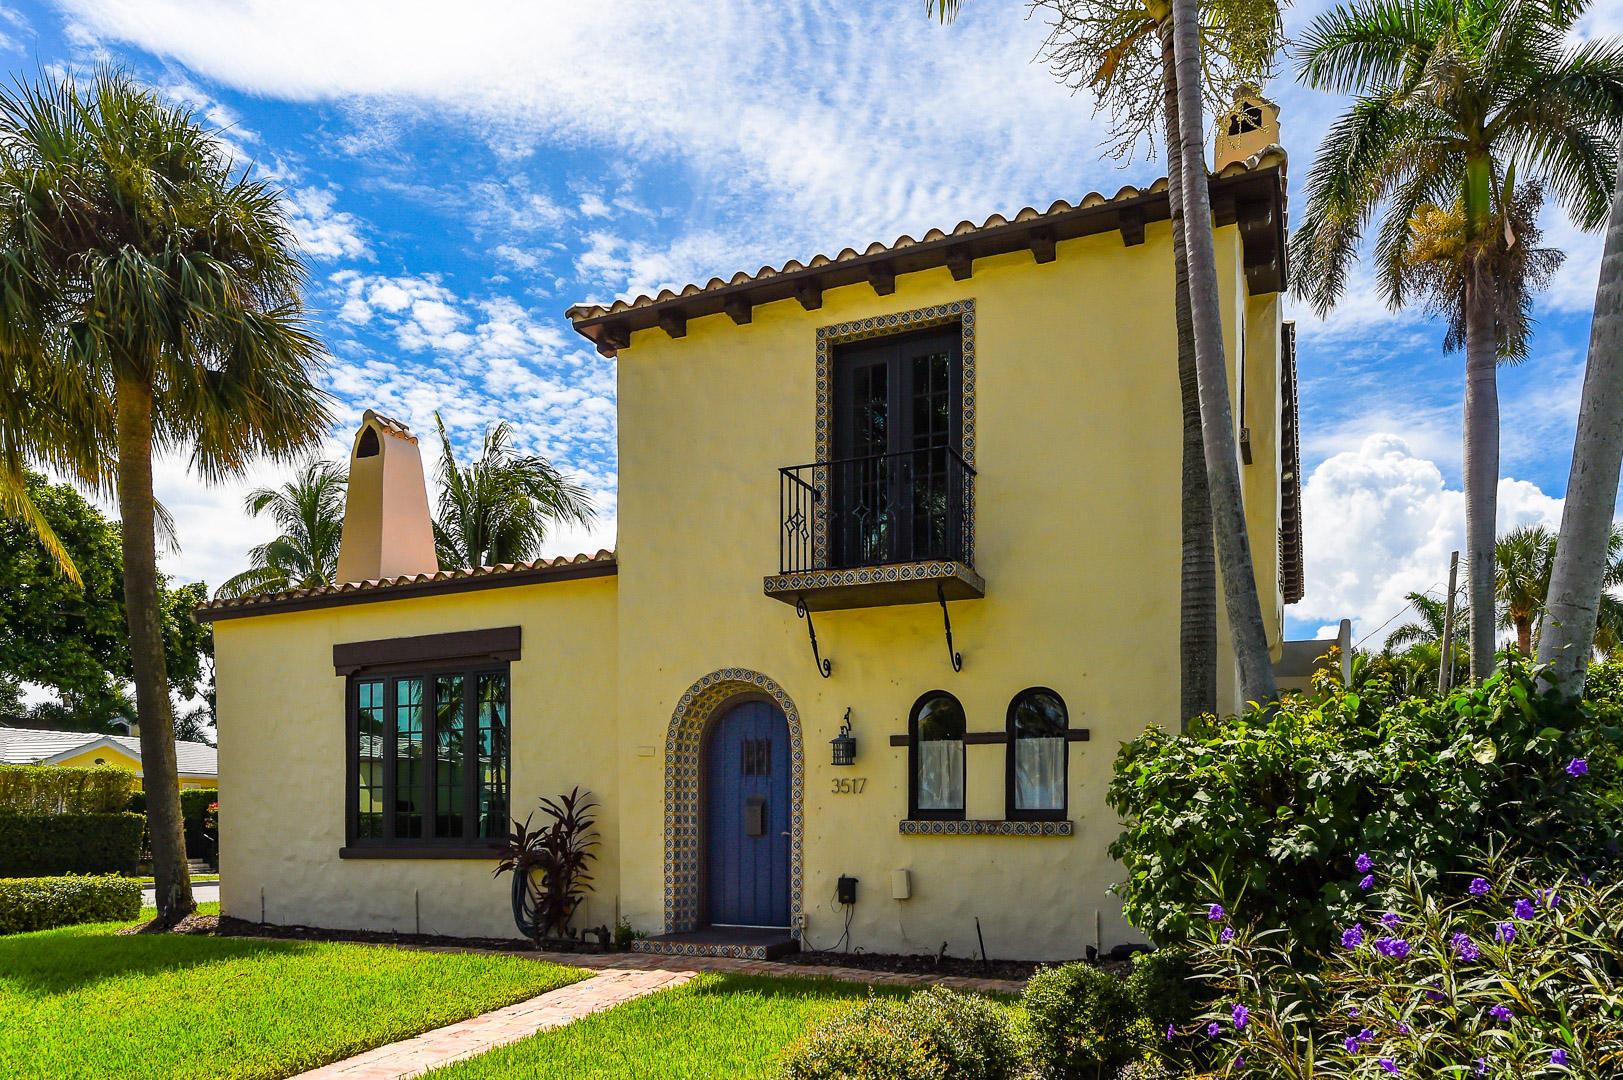 3517 Washington Road, West Palm Beach, Florida 33405, 5 Bedrooms Bedrooms, ,4 BathroomsBathrooms,Single Family,For Sale,Washington,RX-10460021